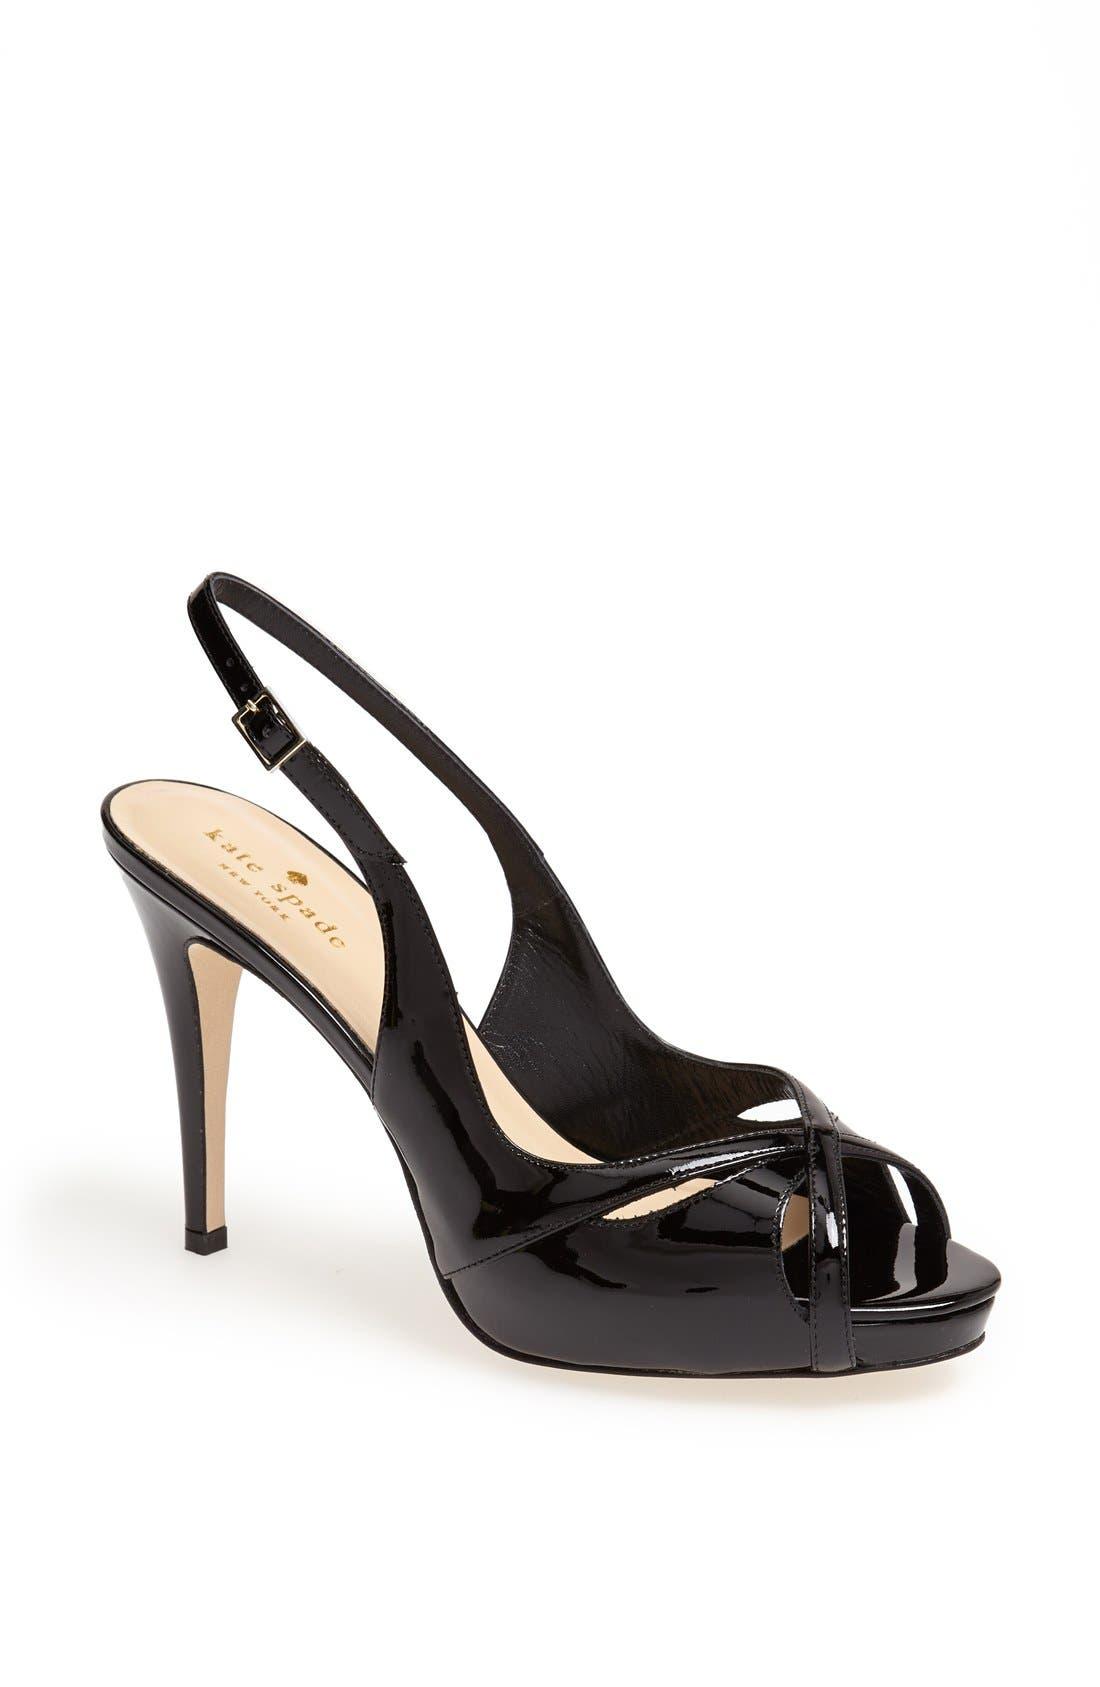 Alternate Image 1 Selected - kate spade new york 'genna' sandal